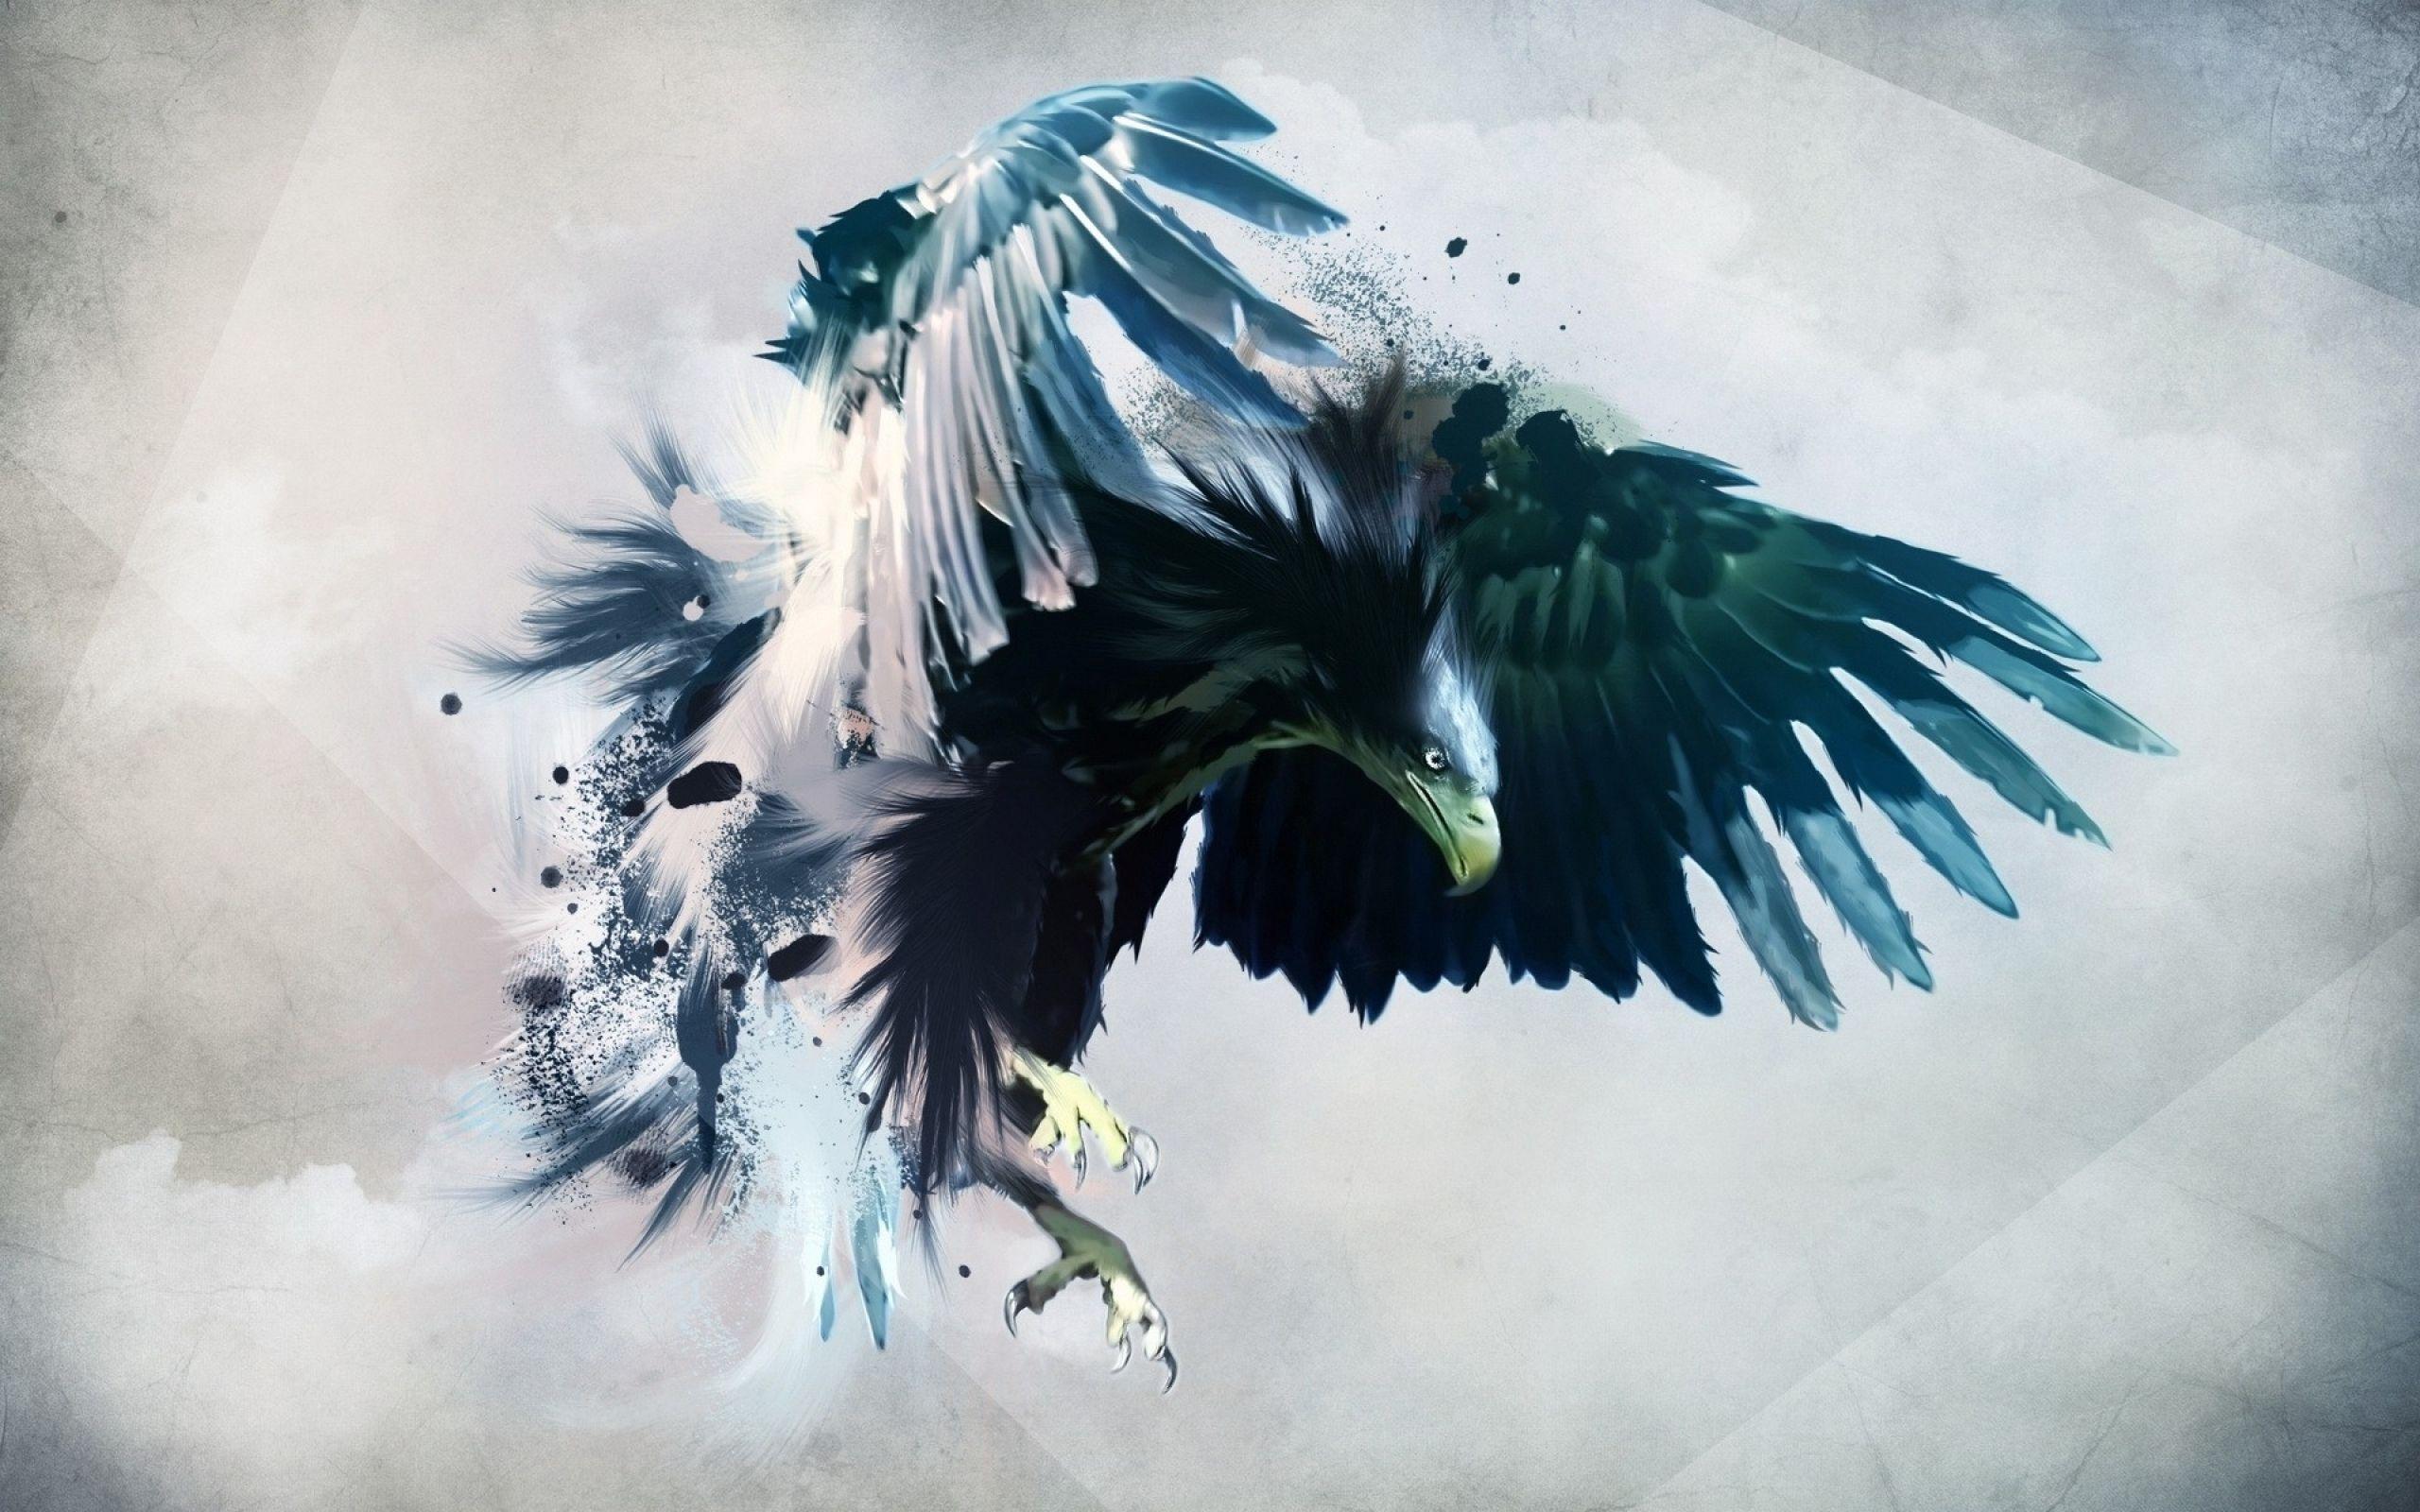 aigle abstrait - Recherche Google